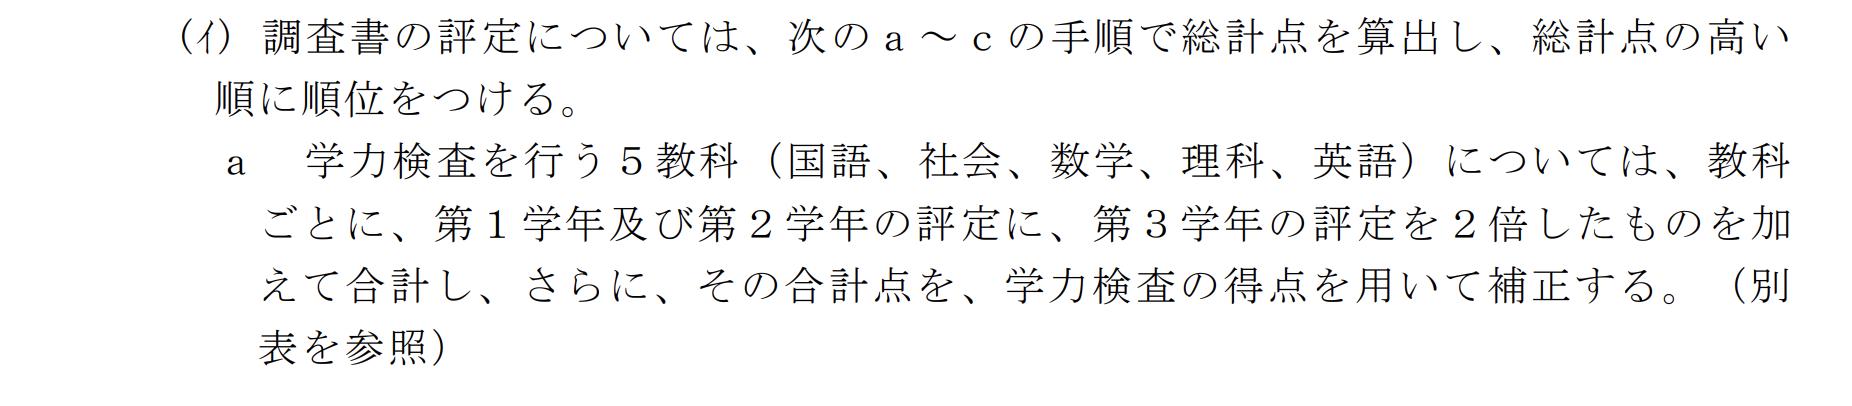 熊本県の公立高校入試制度2